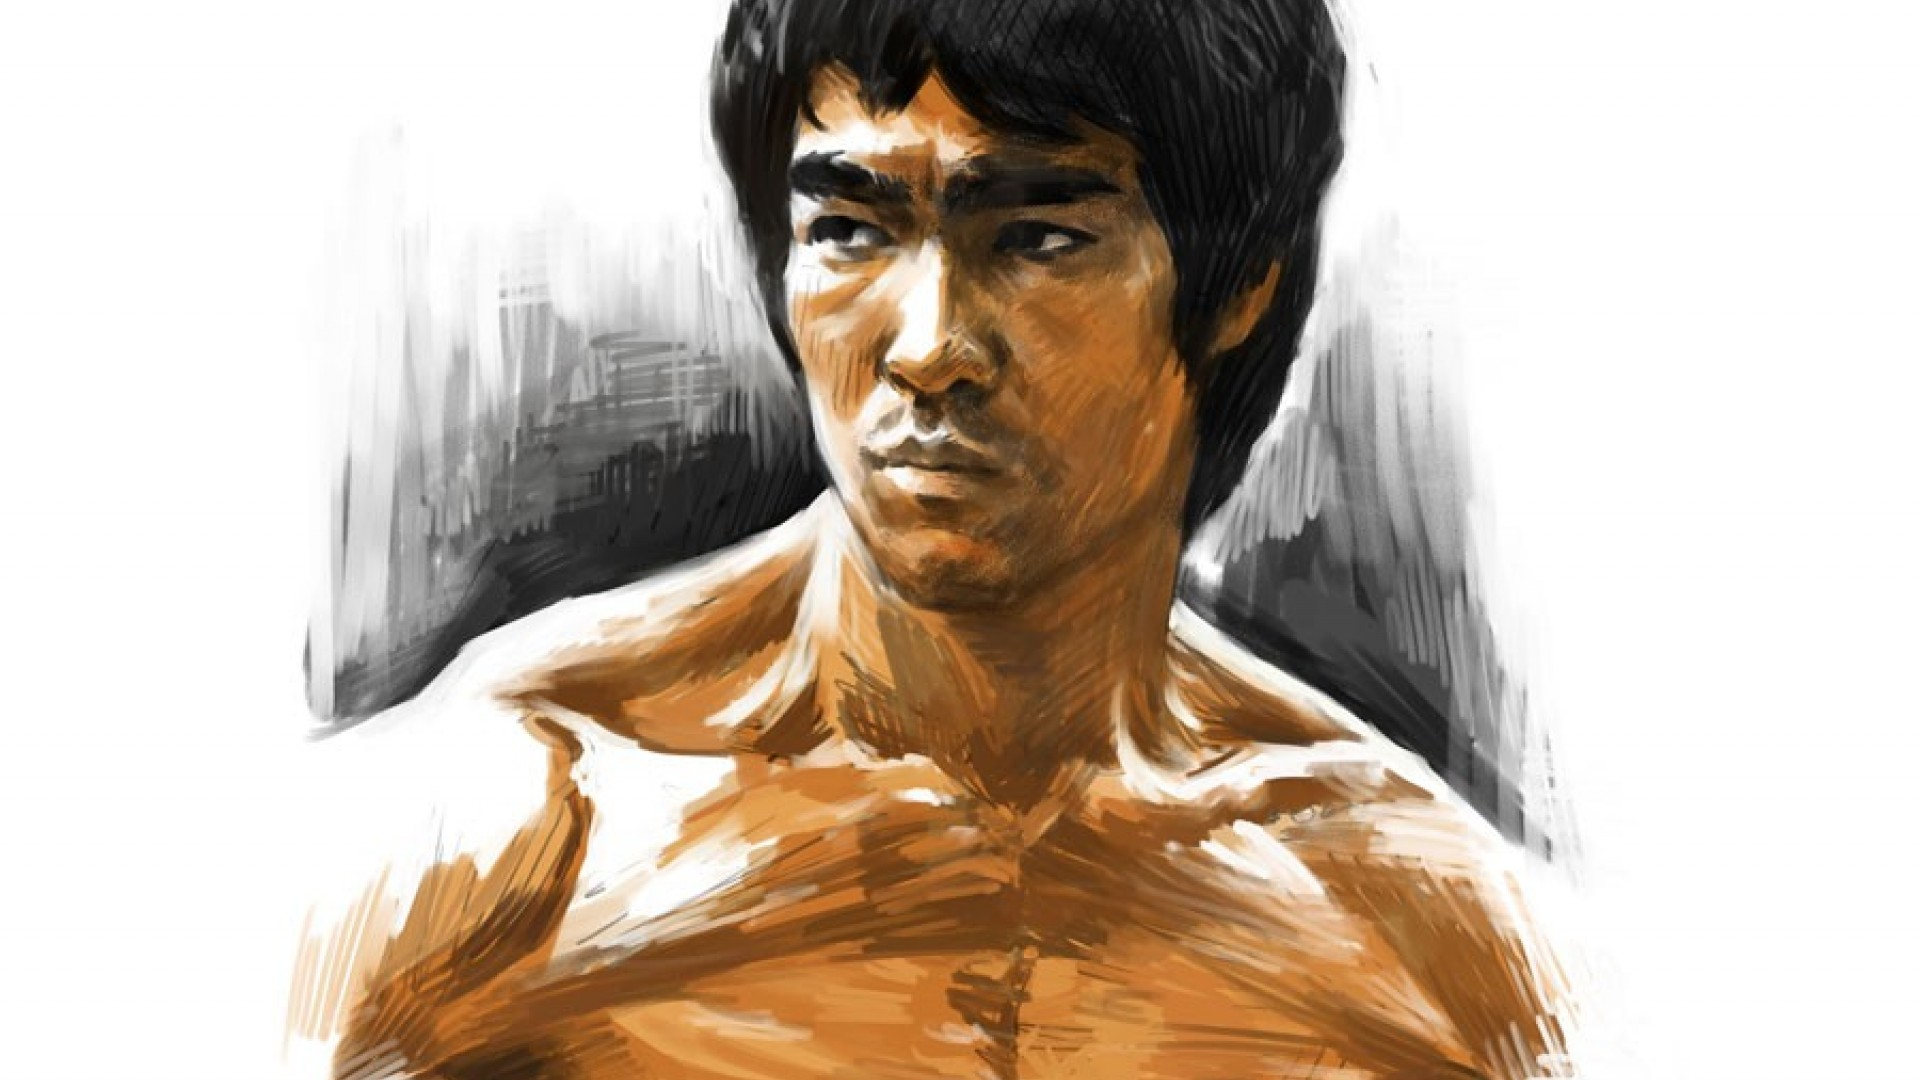 Bruce Lee Images Free Download